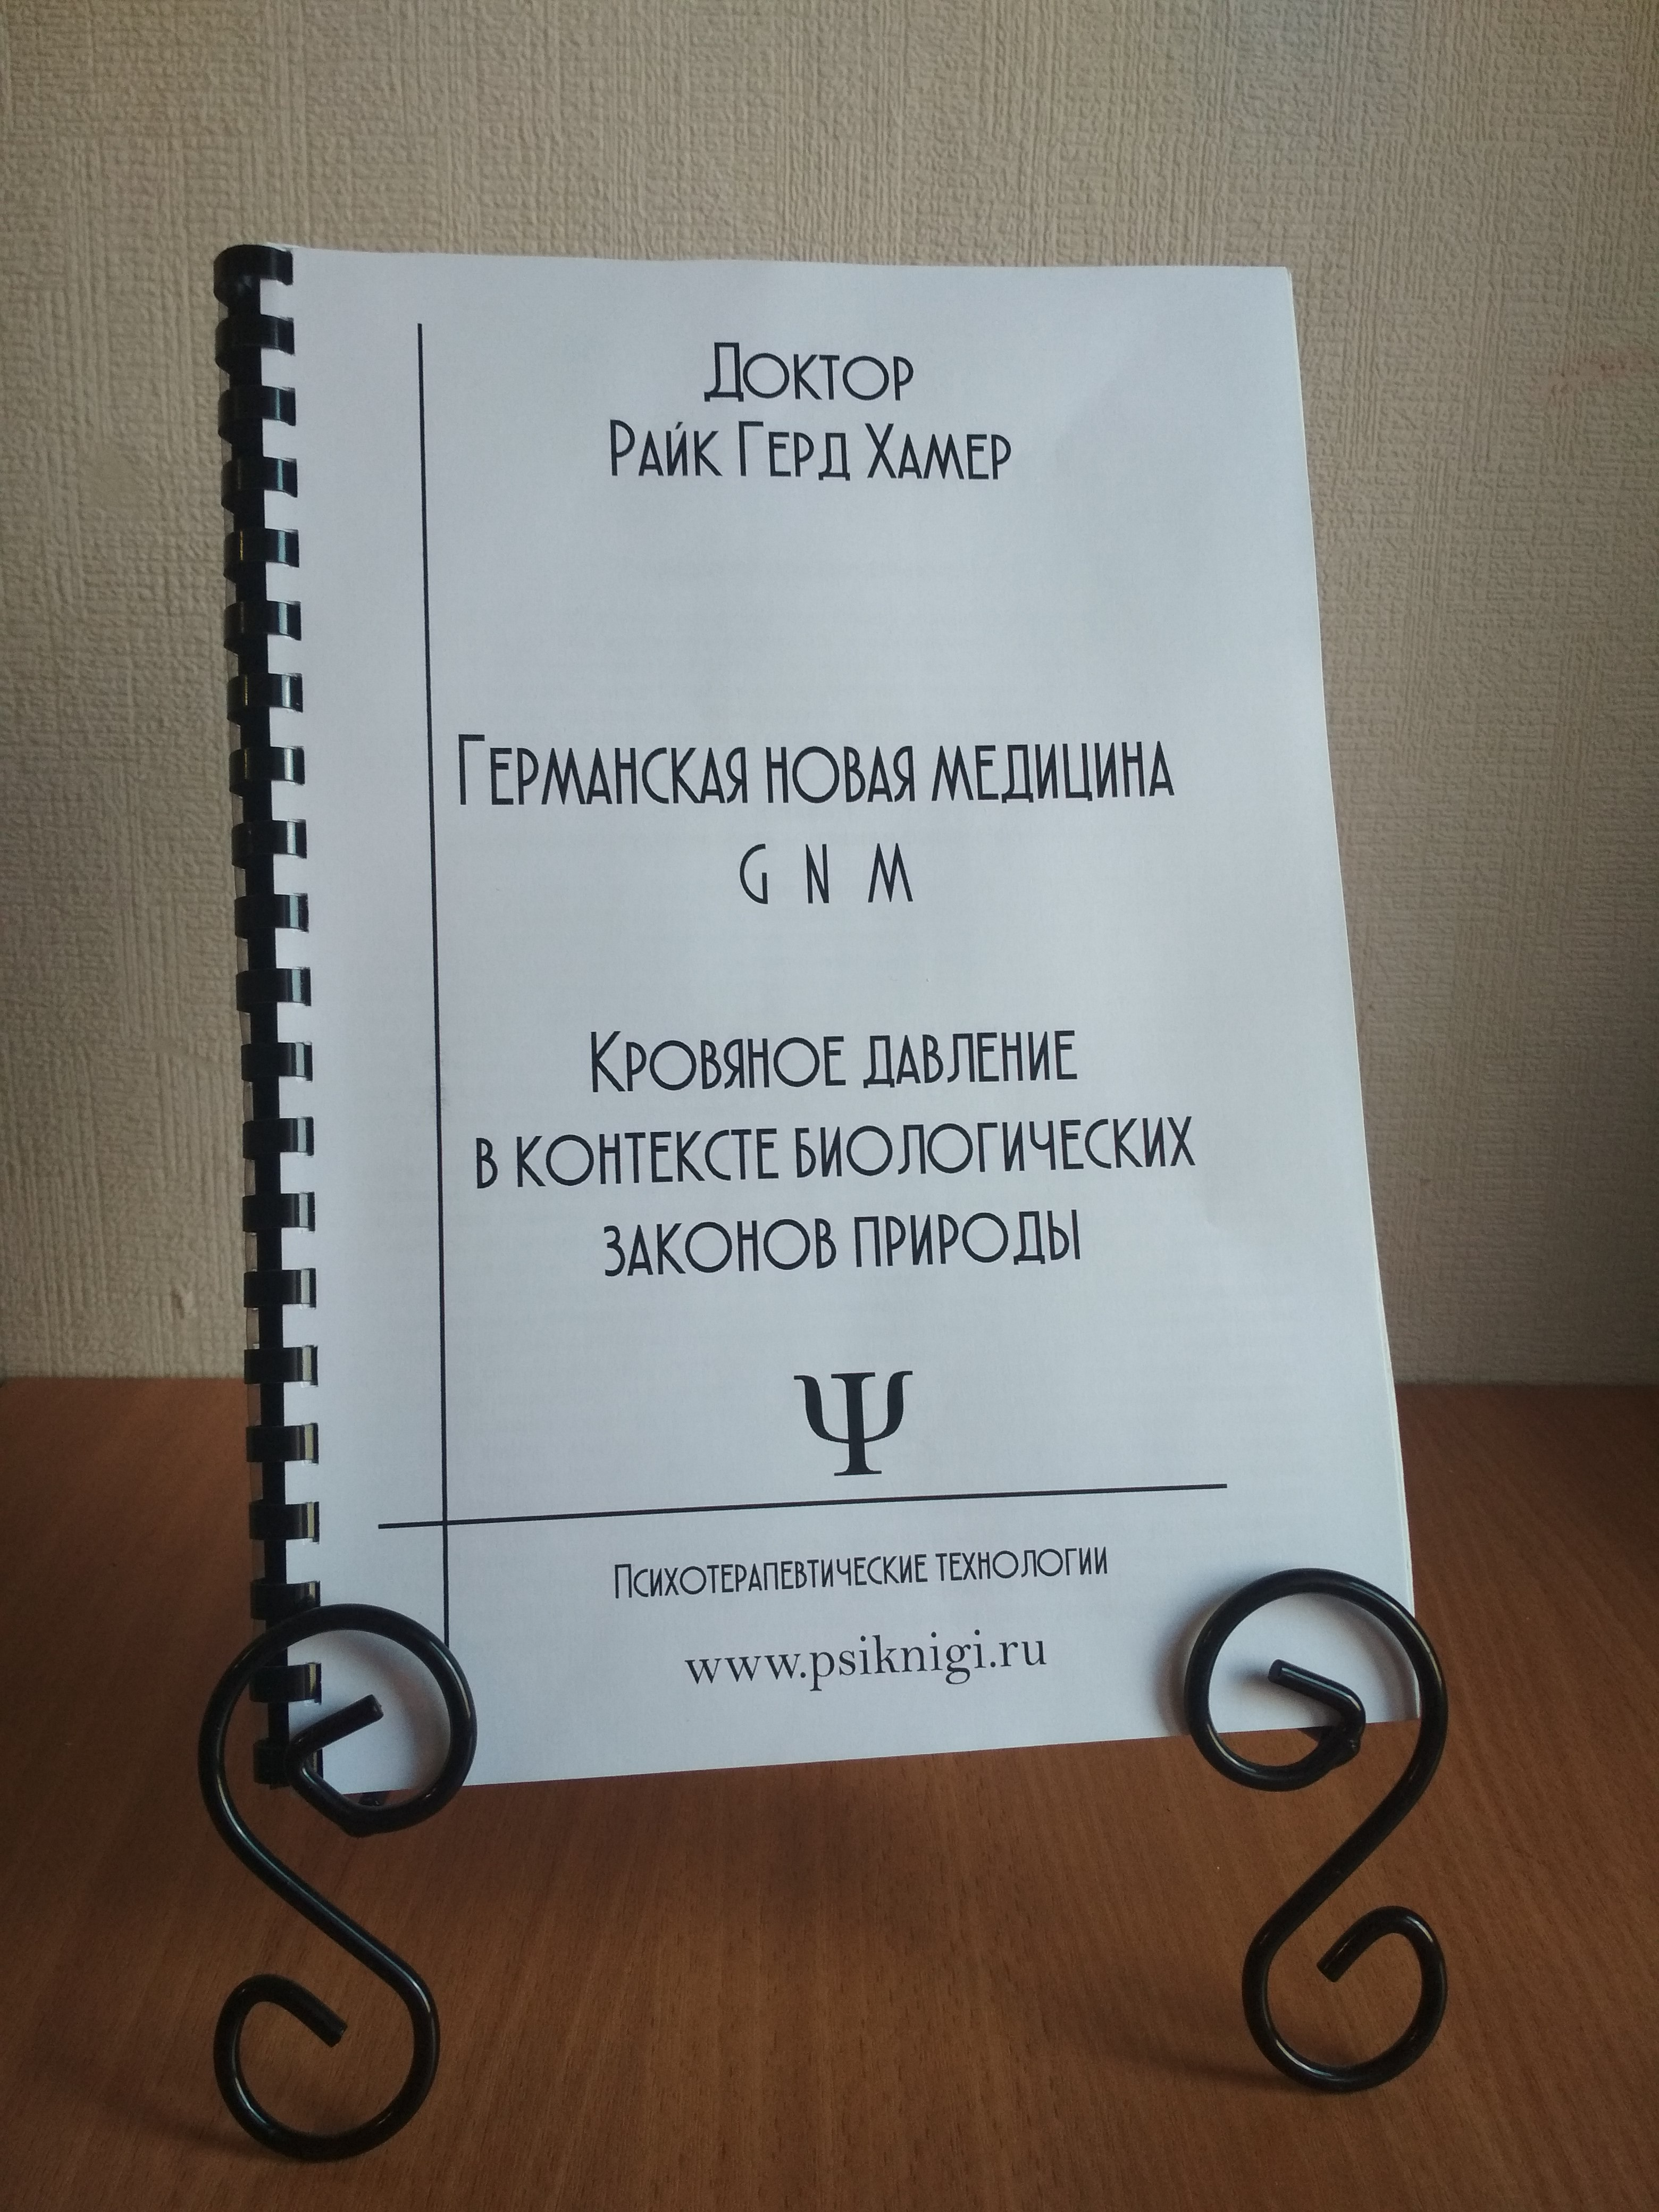 германская новая медицина хаммер книга, новая германская медицина хаммер, новая германская медицина доктора, германская новая медицина хаммер книга купить